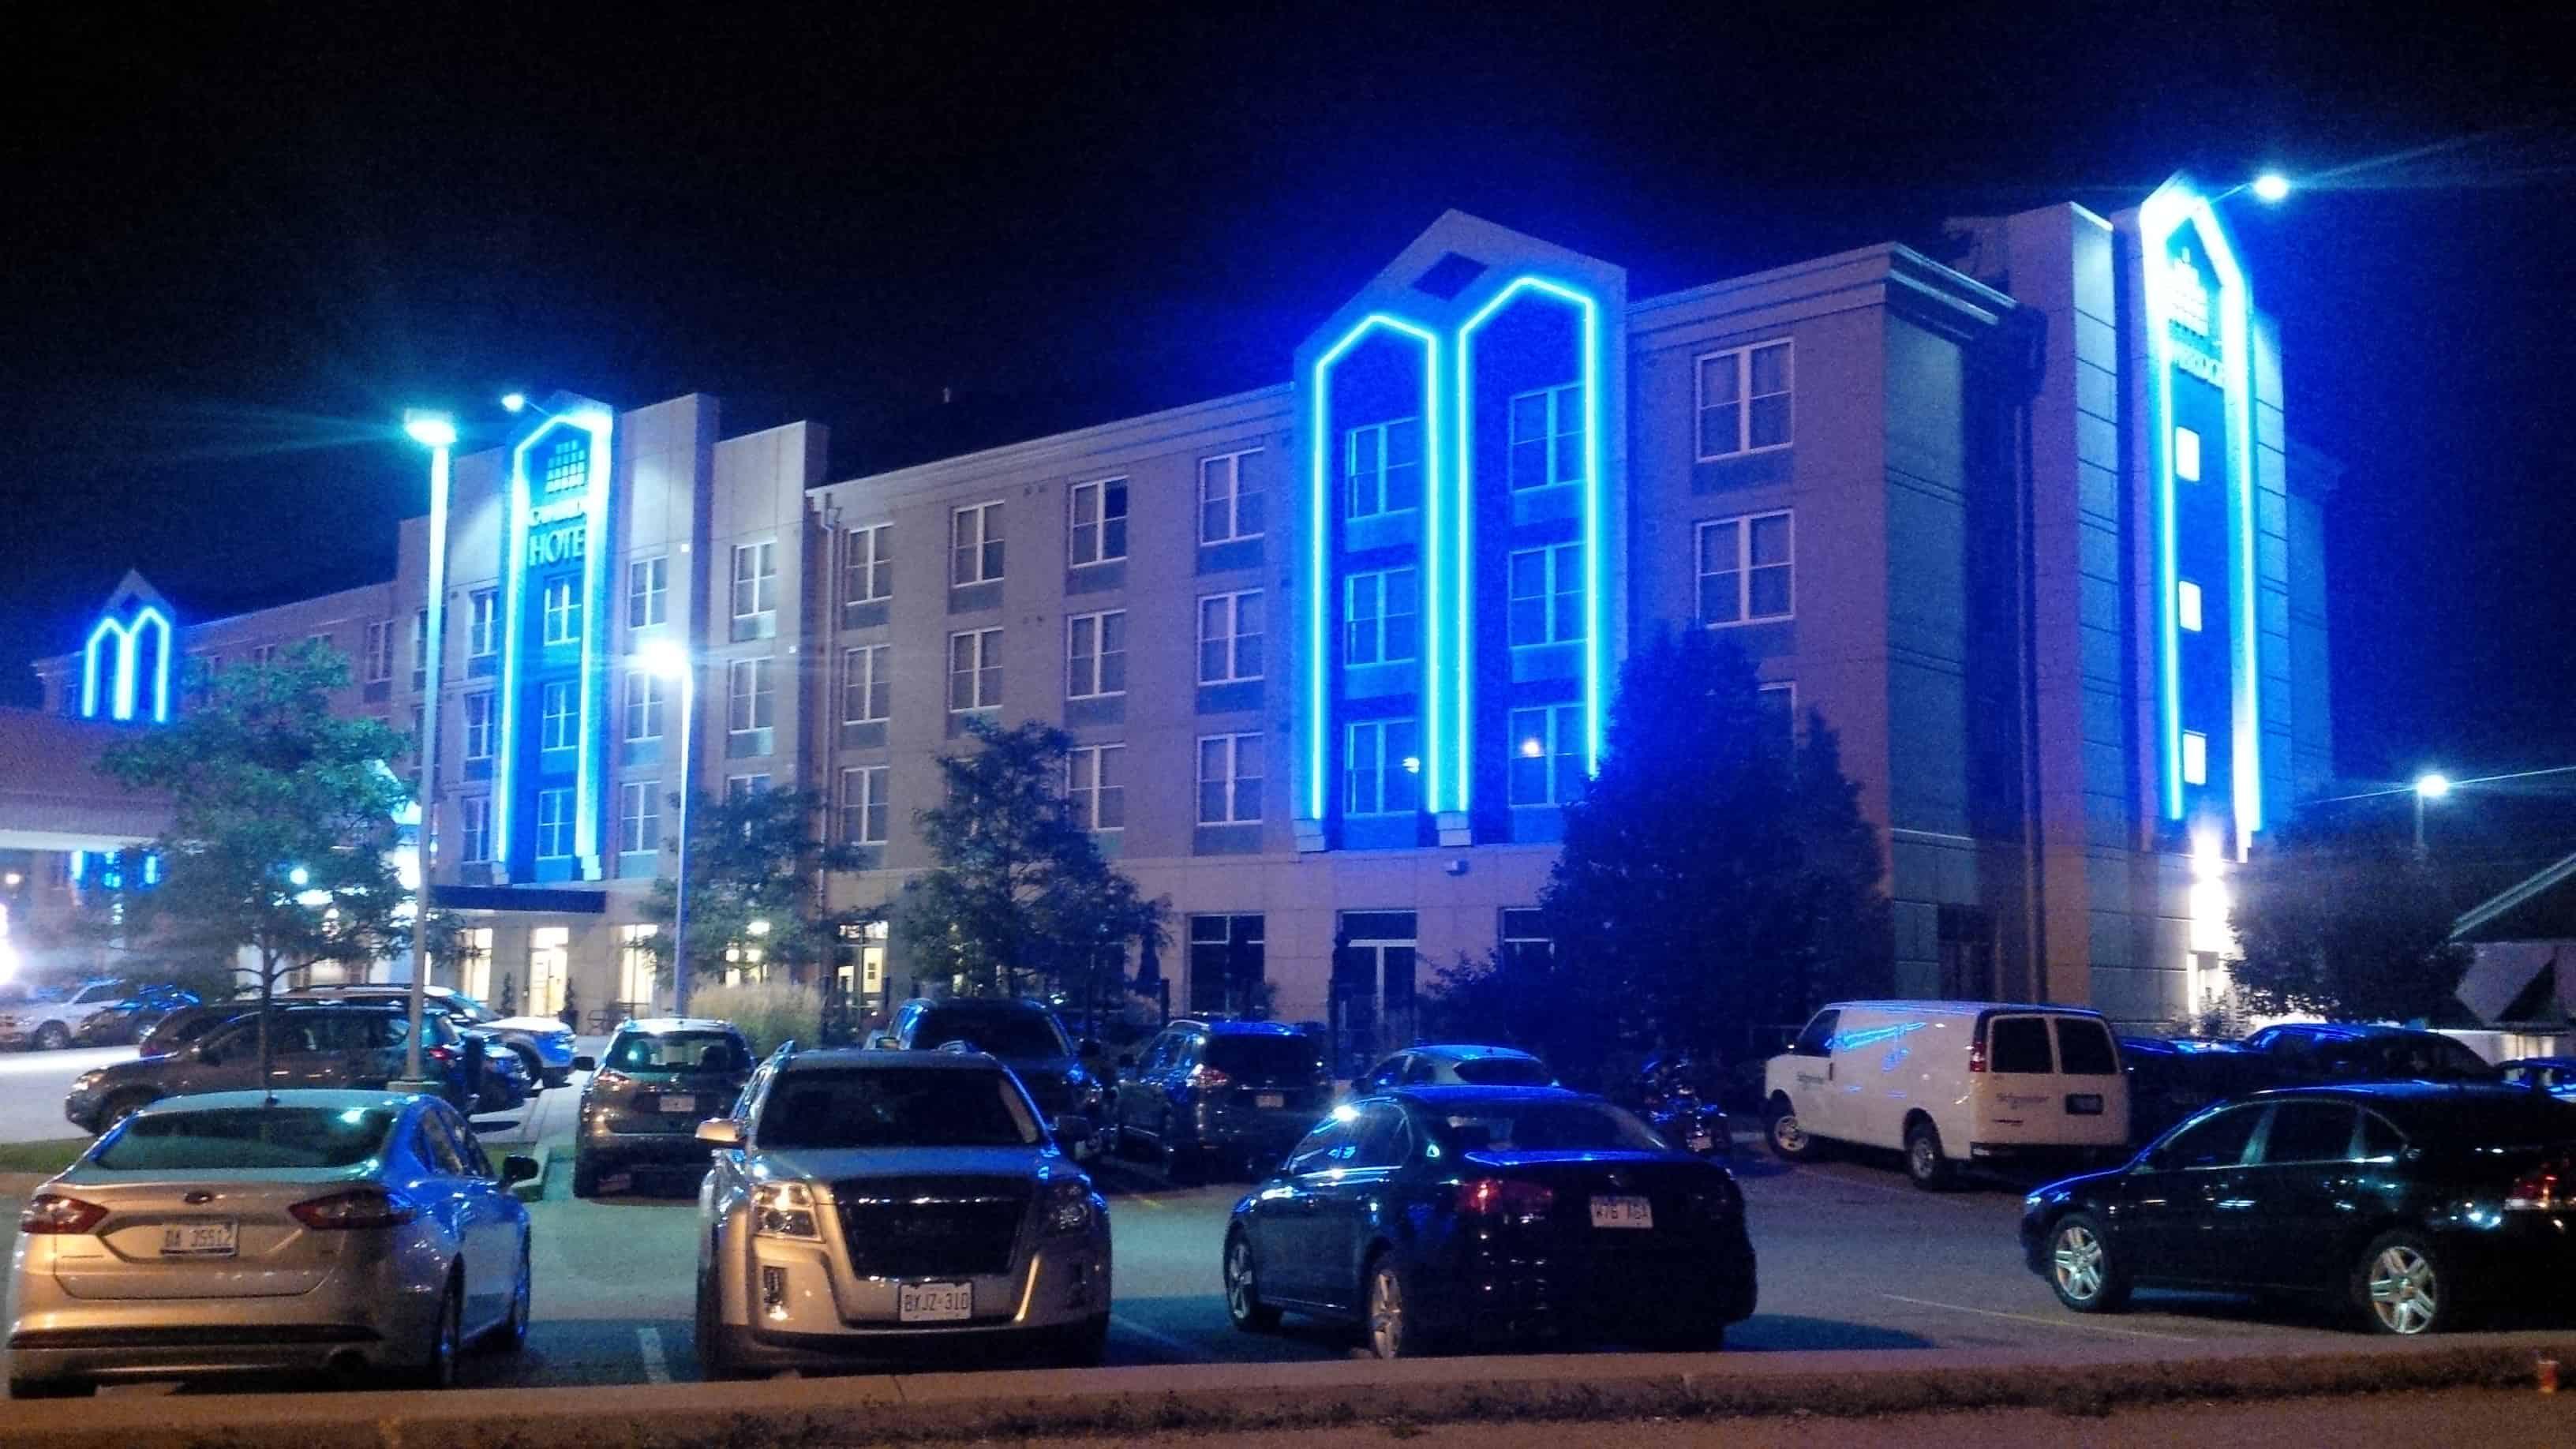 Exterior accent lighting upgrade for cambridge hotel - Exterior accent lighting for home ...